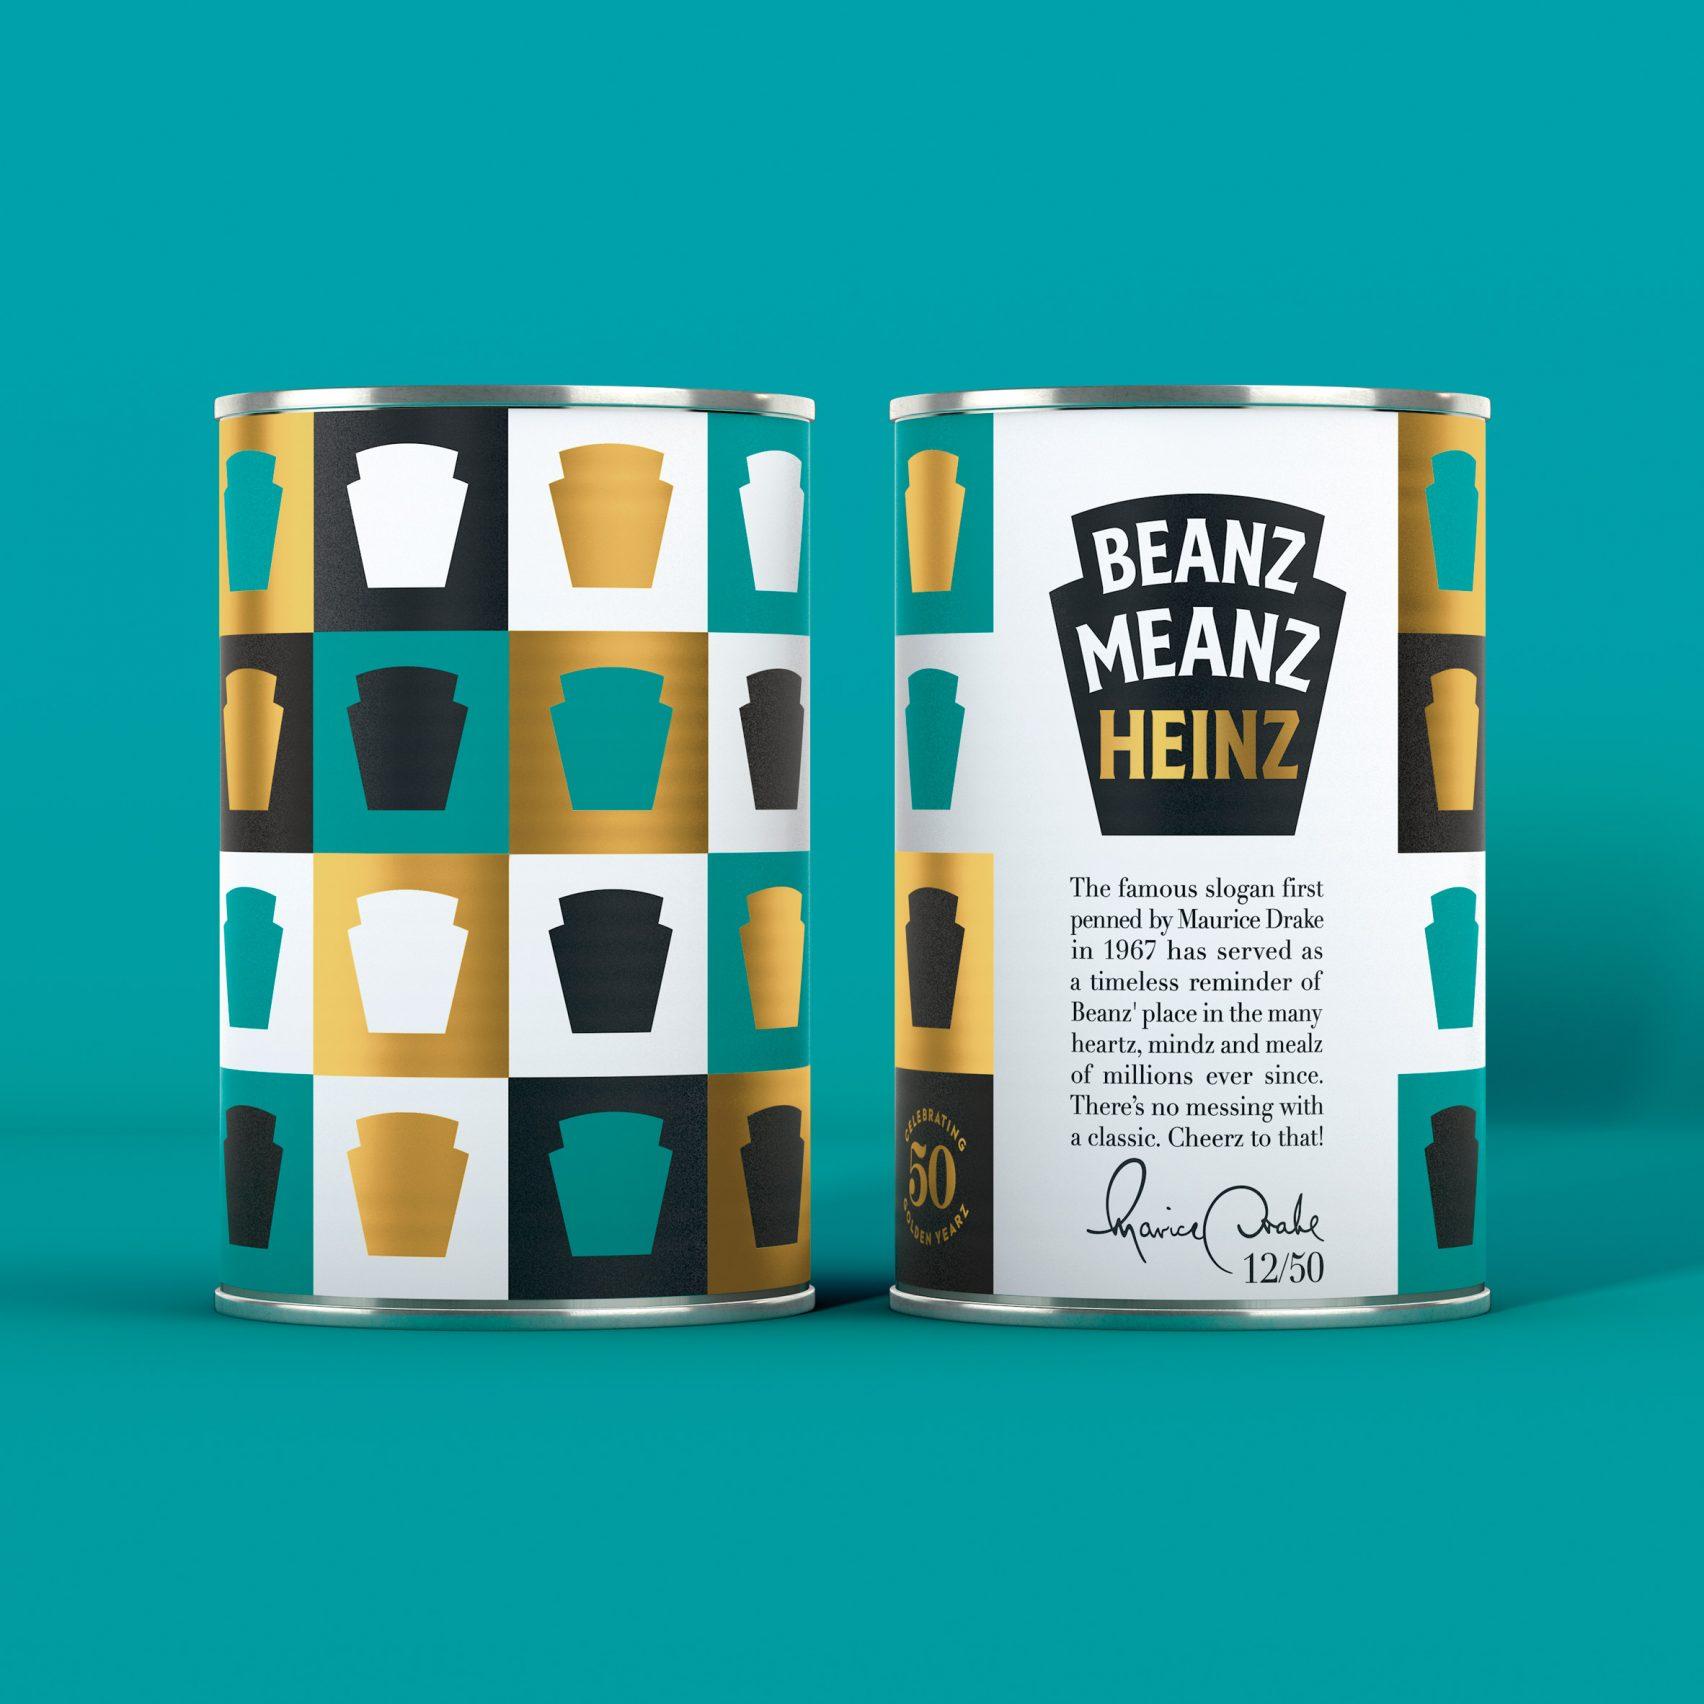 Beanz Meanz Heinz by JKR